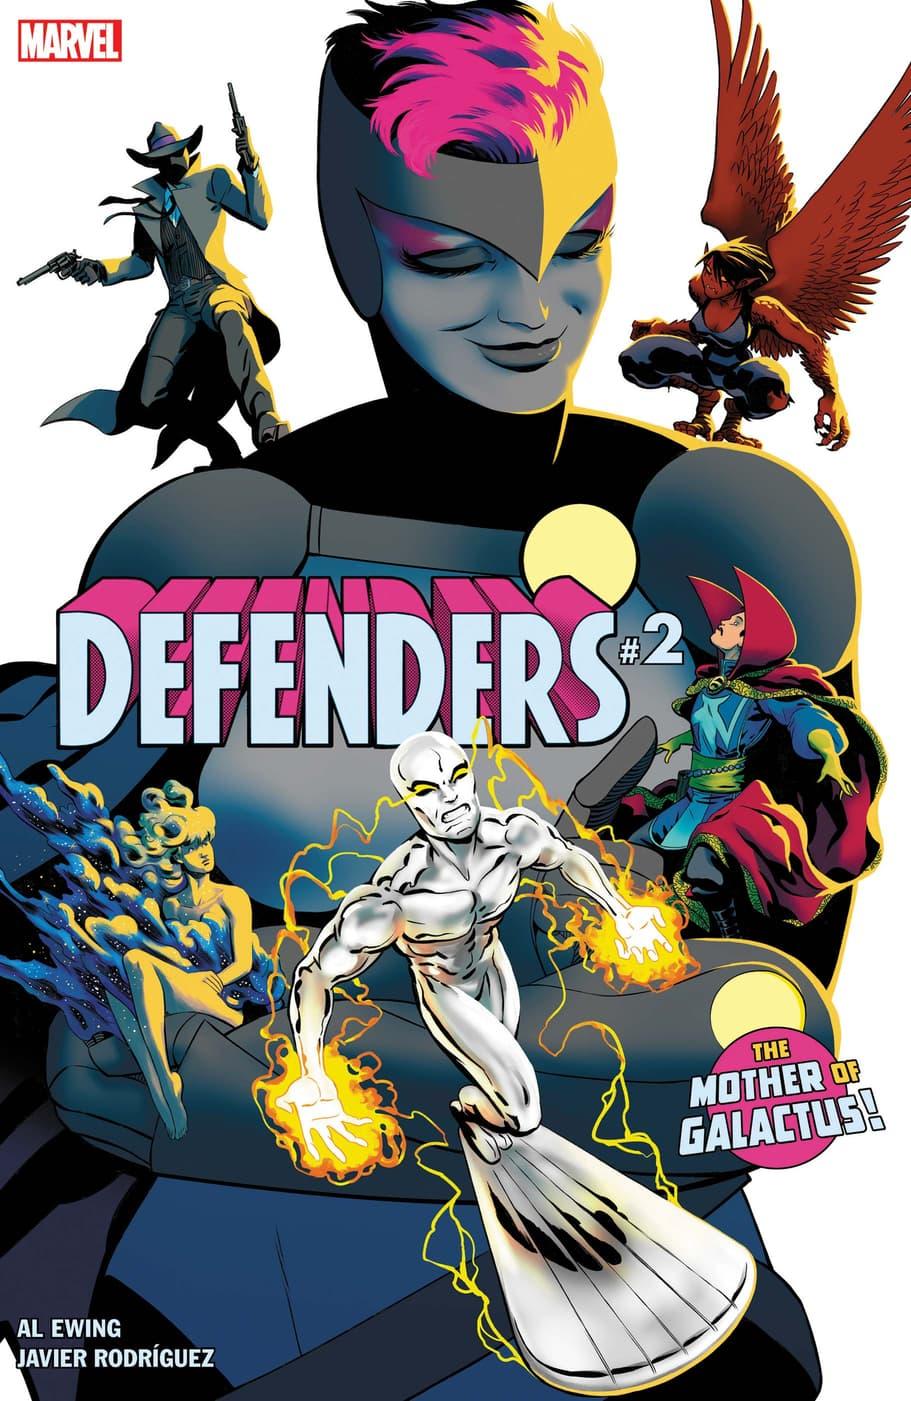 DEFENDERS #2 cover by Javier Rodriguez